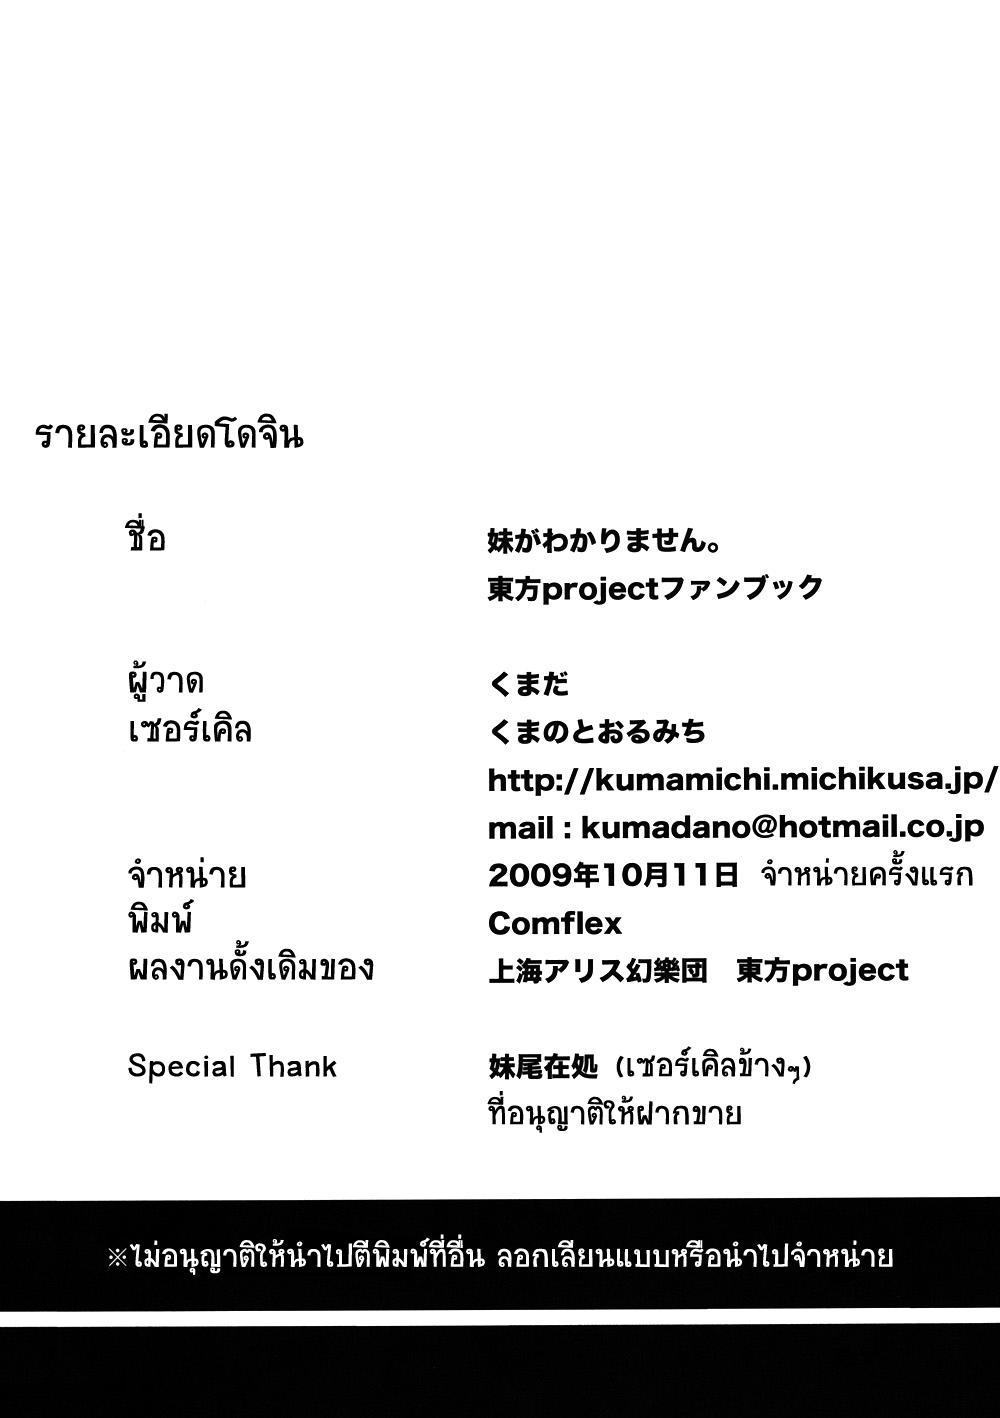 http://db.thaianime.net/images/Tatsuya/idontunderstandmysister22.jpg